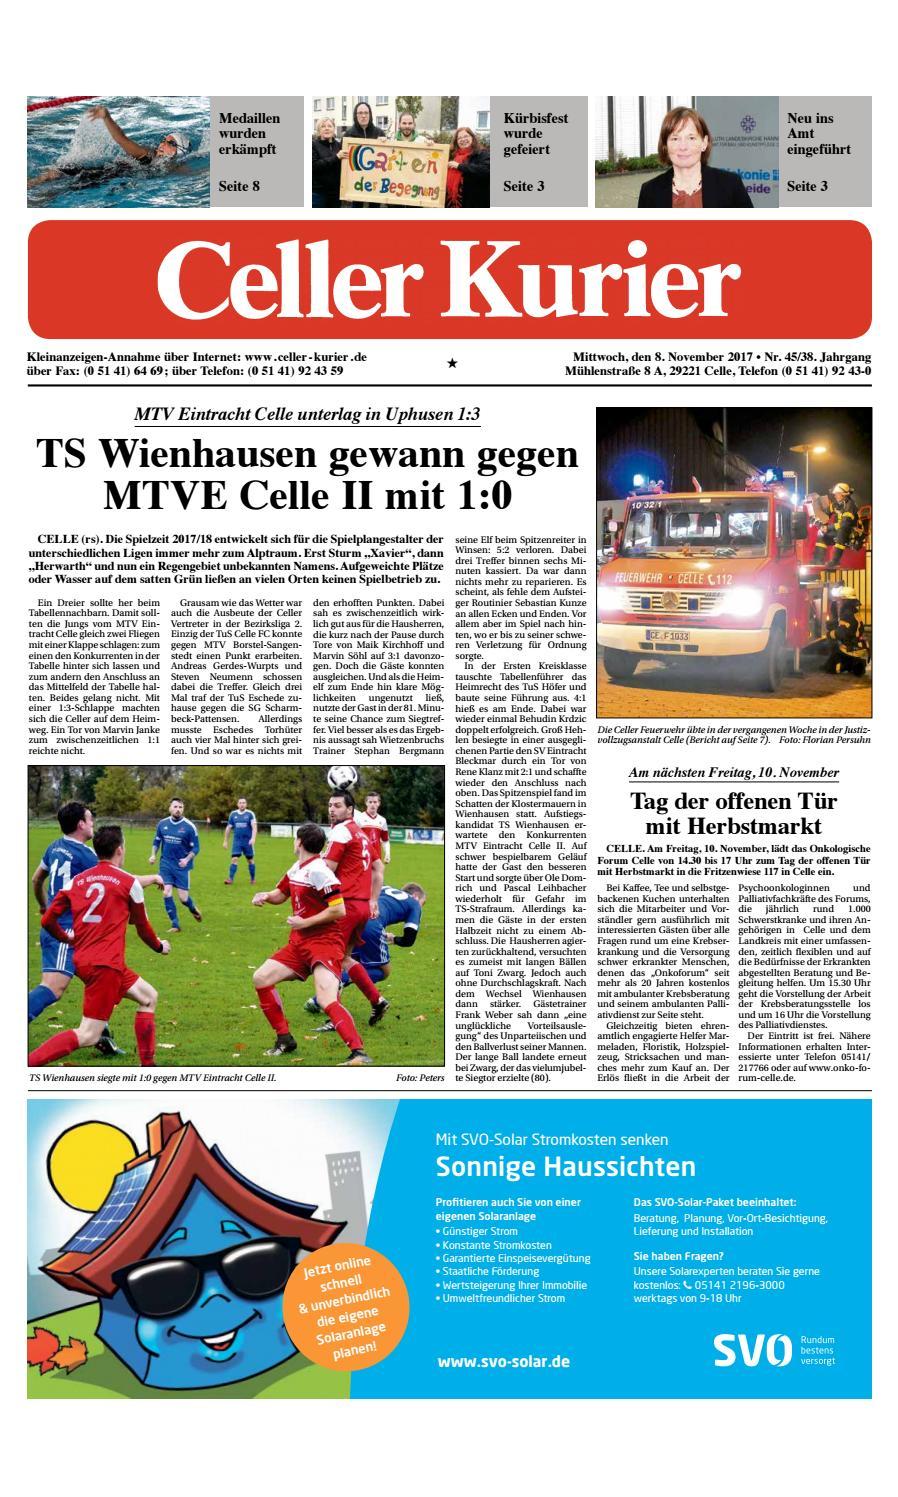 KW45 Celler Kurier Ausgabe Mittwoch by Celler Kurier - issuu